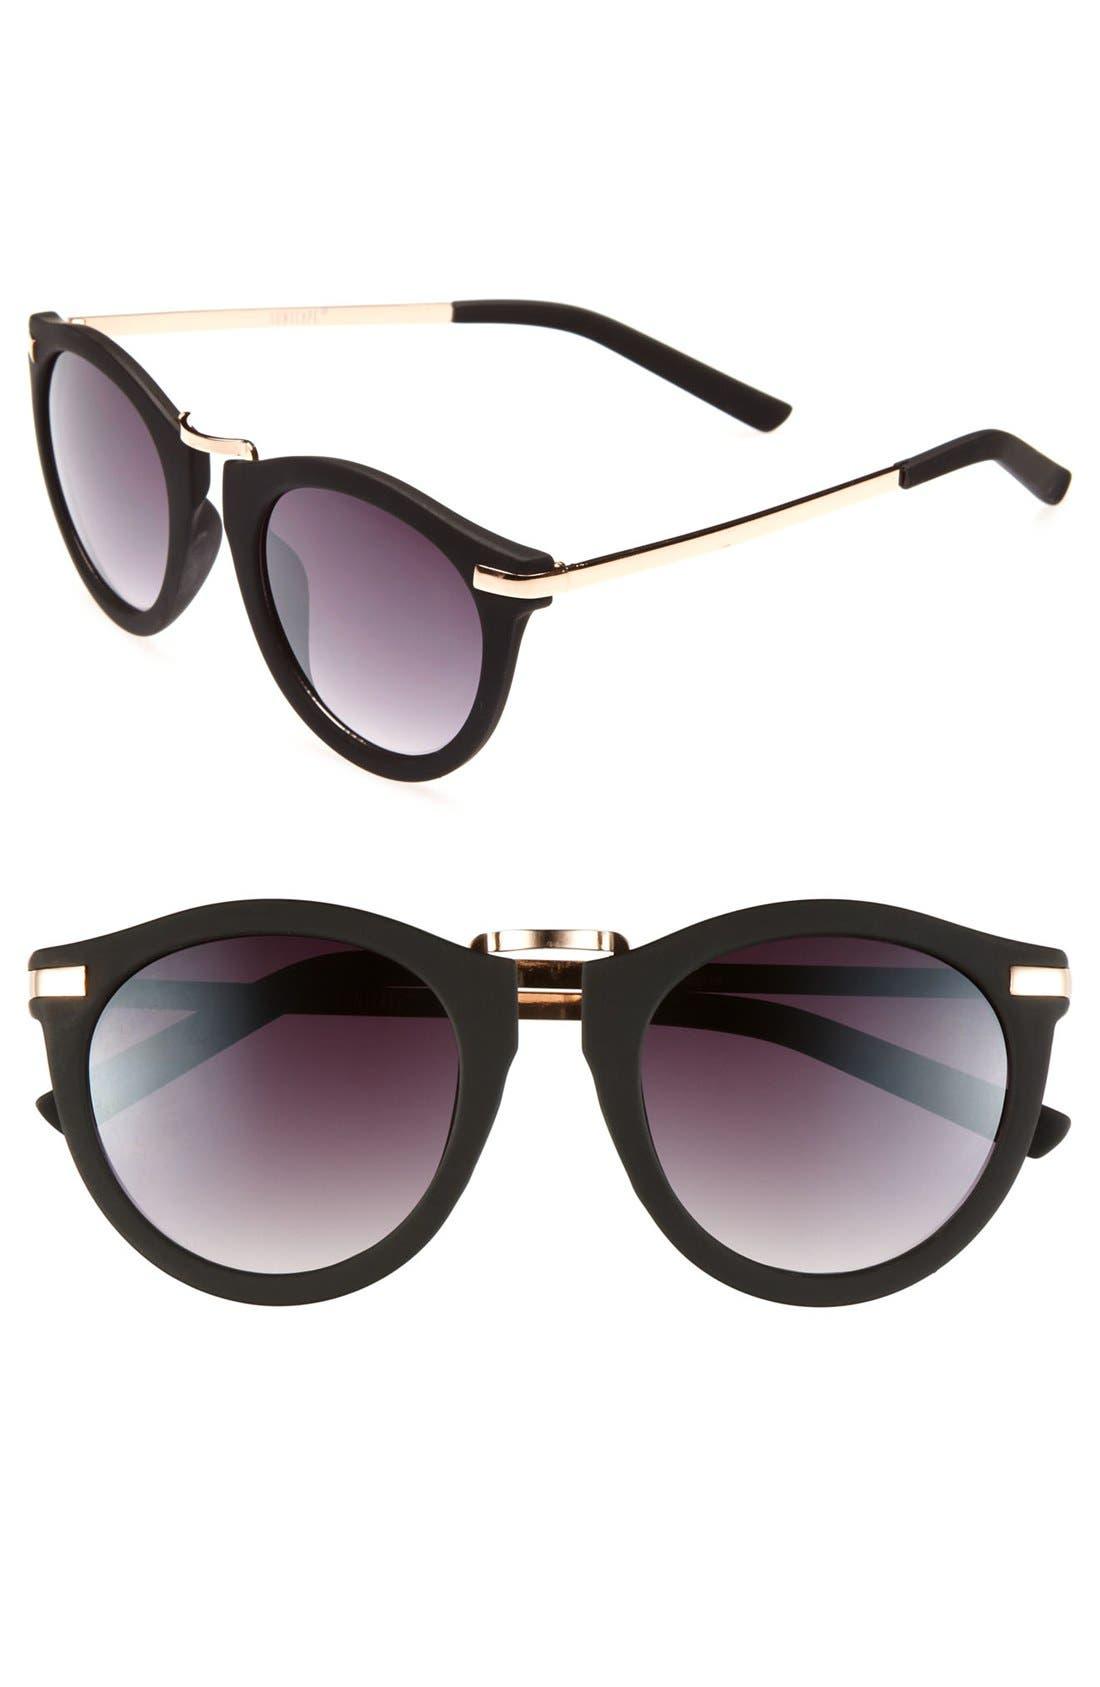 Main Image - BP. Round Retro Sunglasses